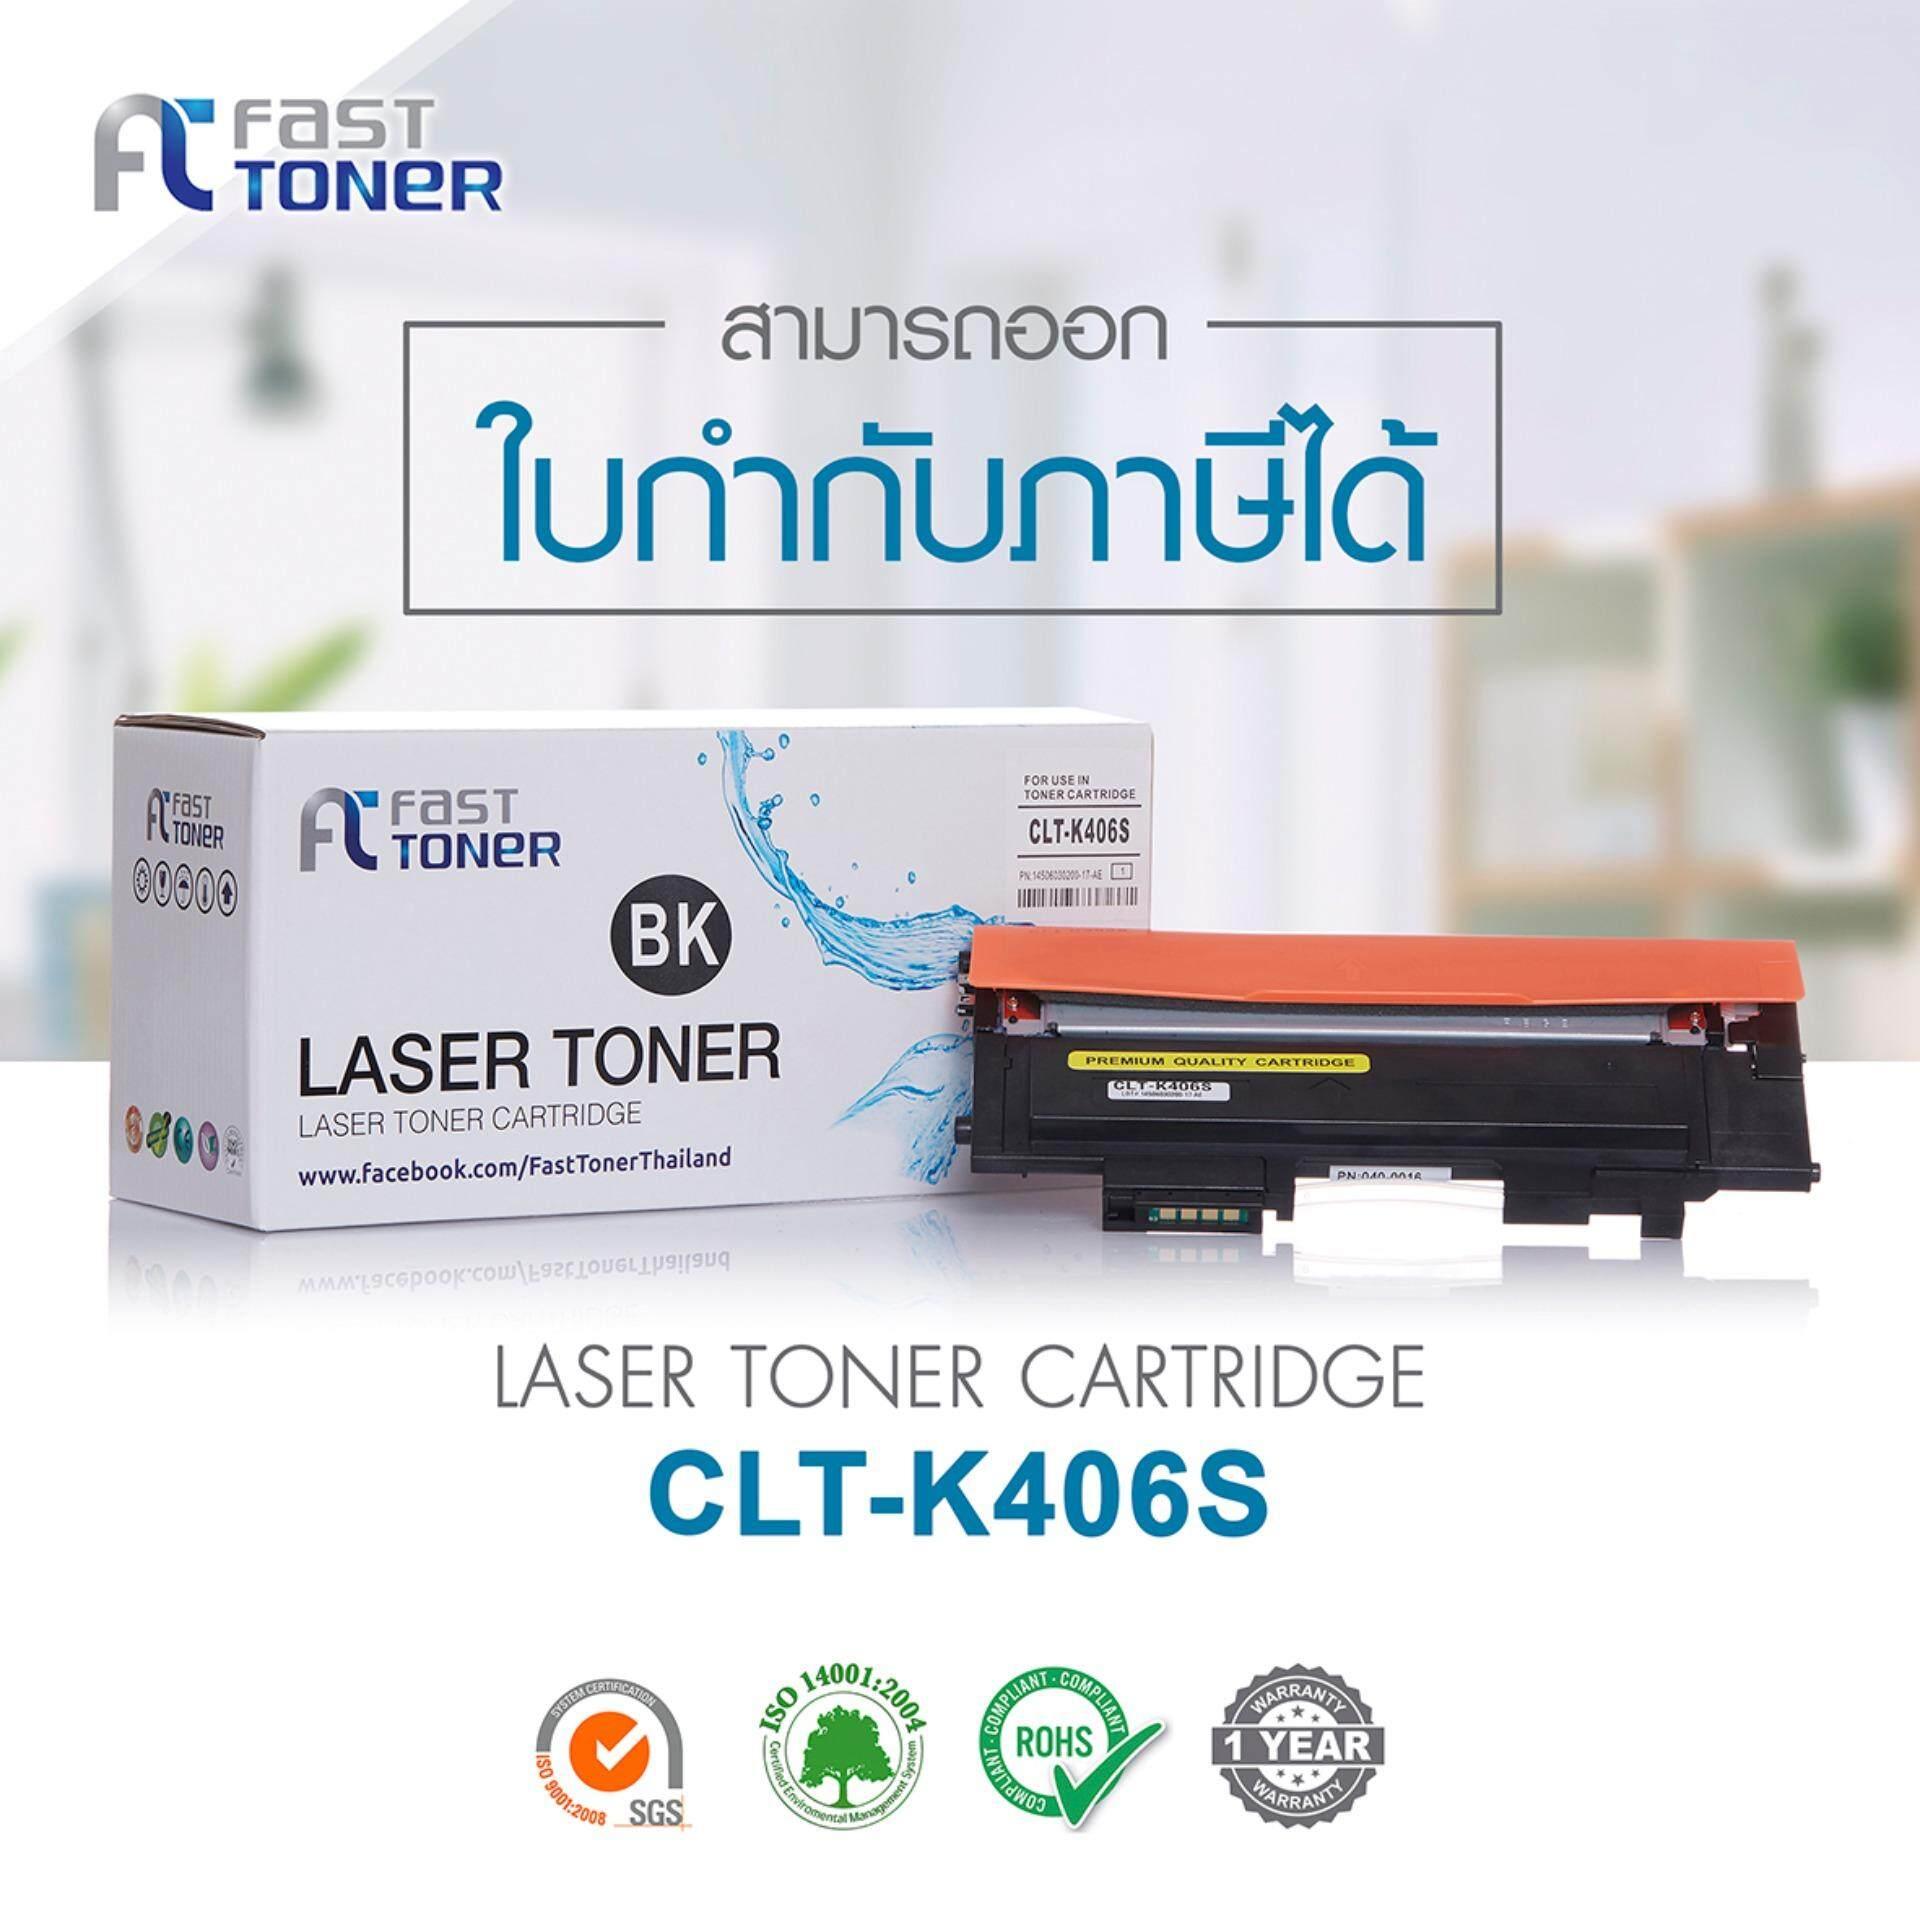 Fast Toner ตลับหมึกเทียบเท่า Samsung Color Laser CLX-3305FN (CLT-K406S) สีดำ